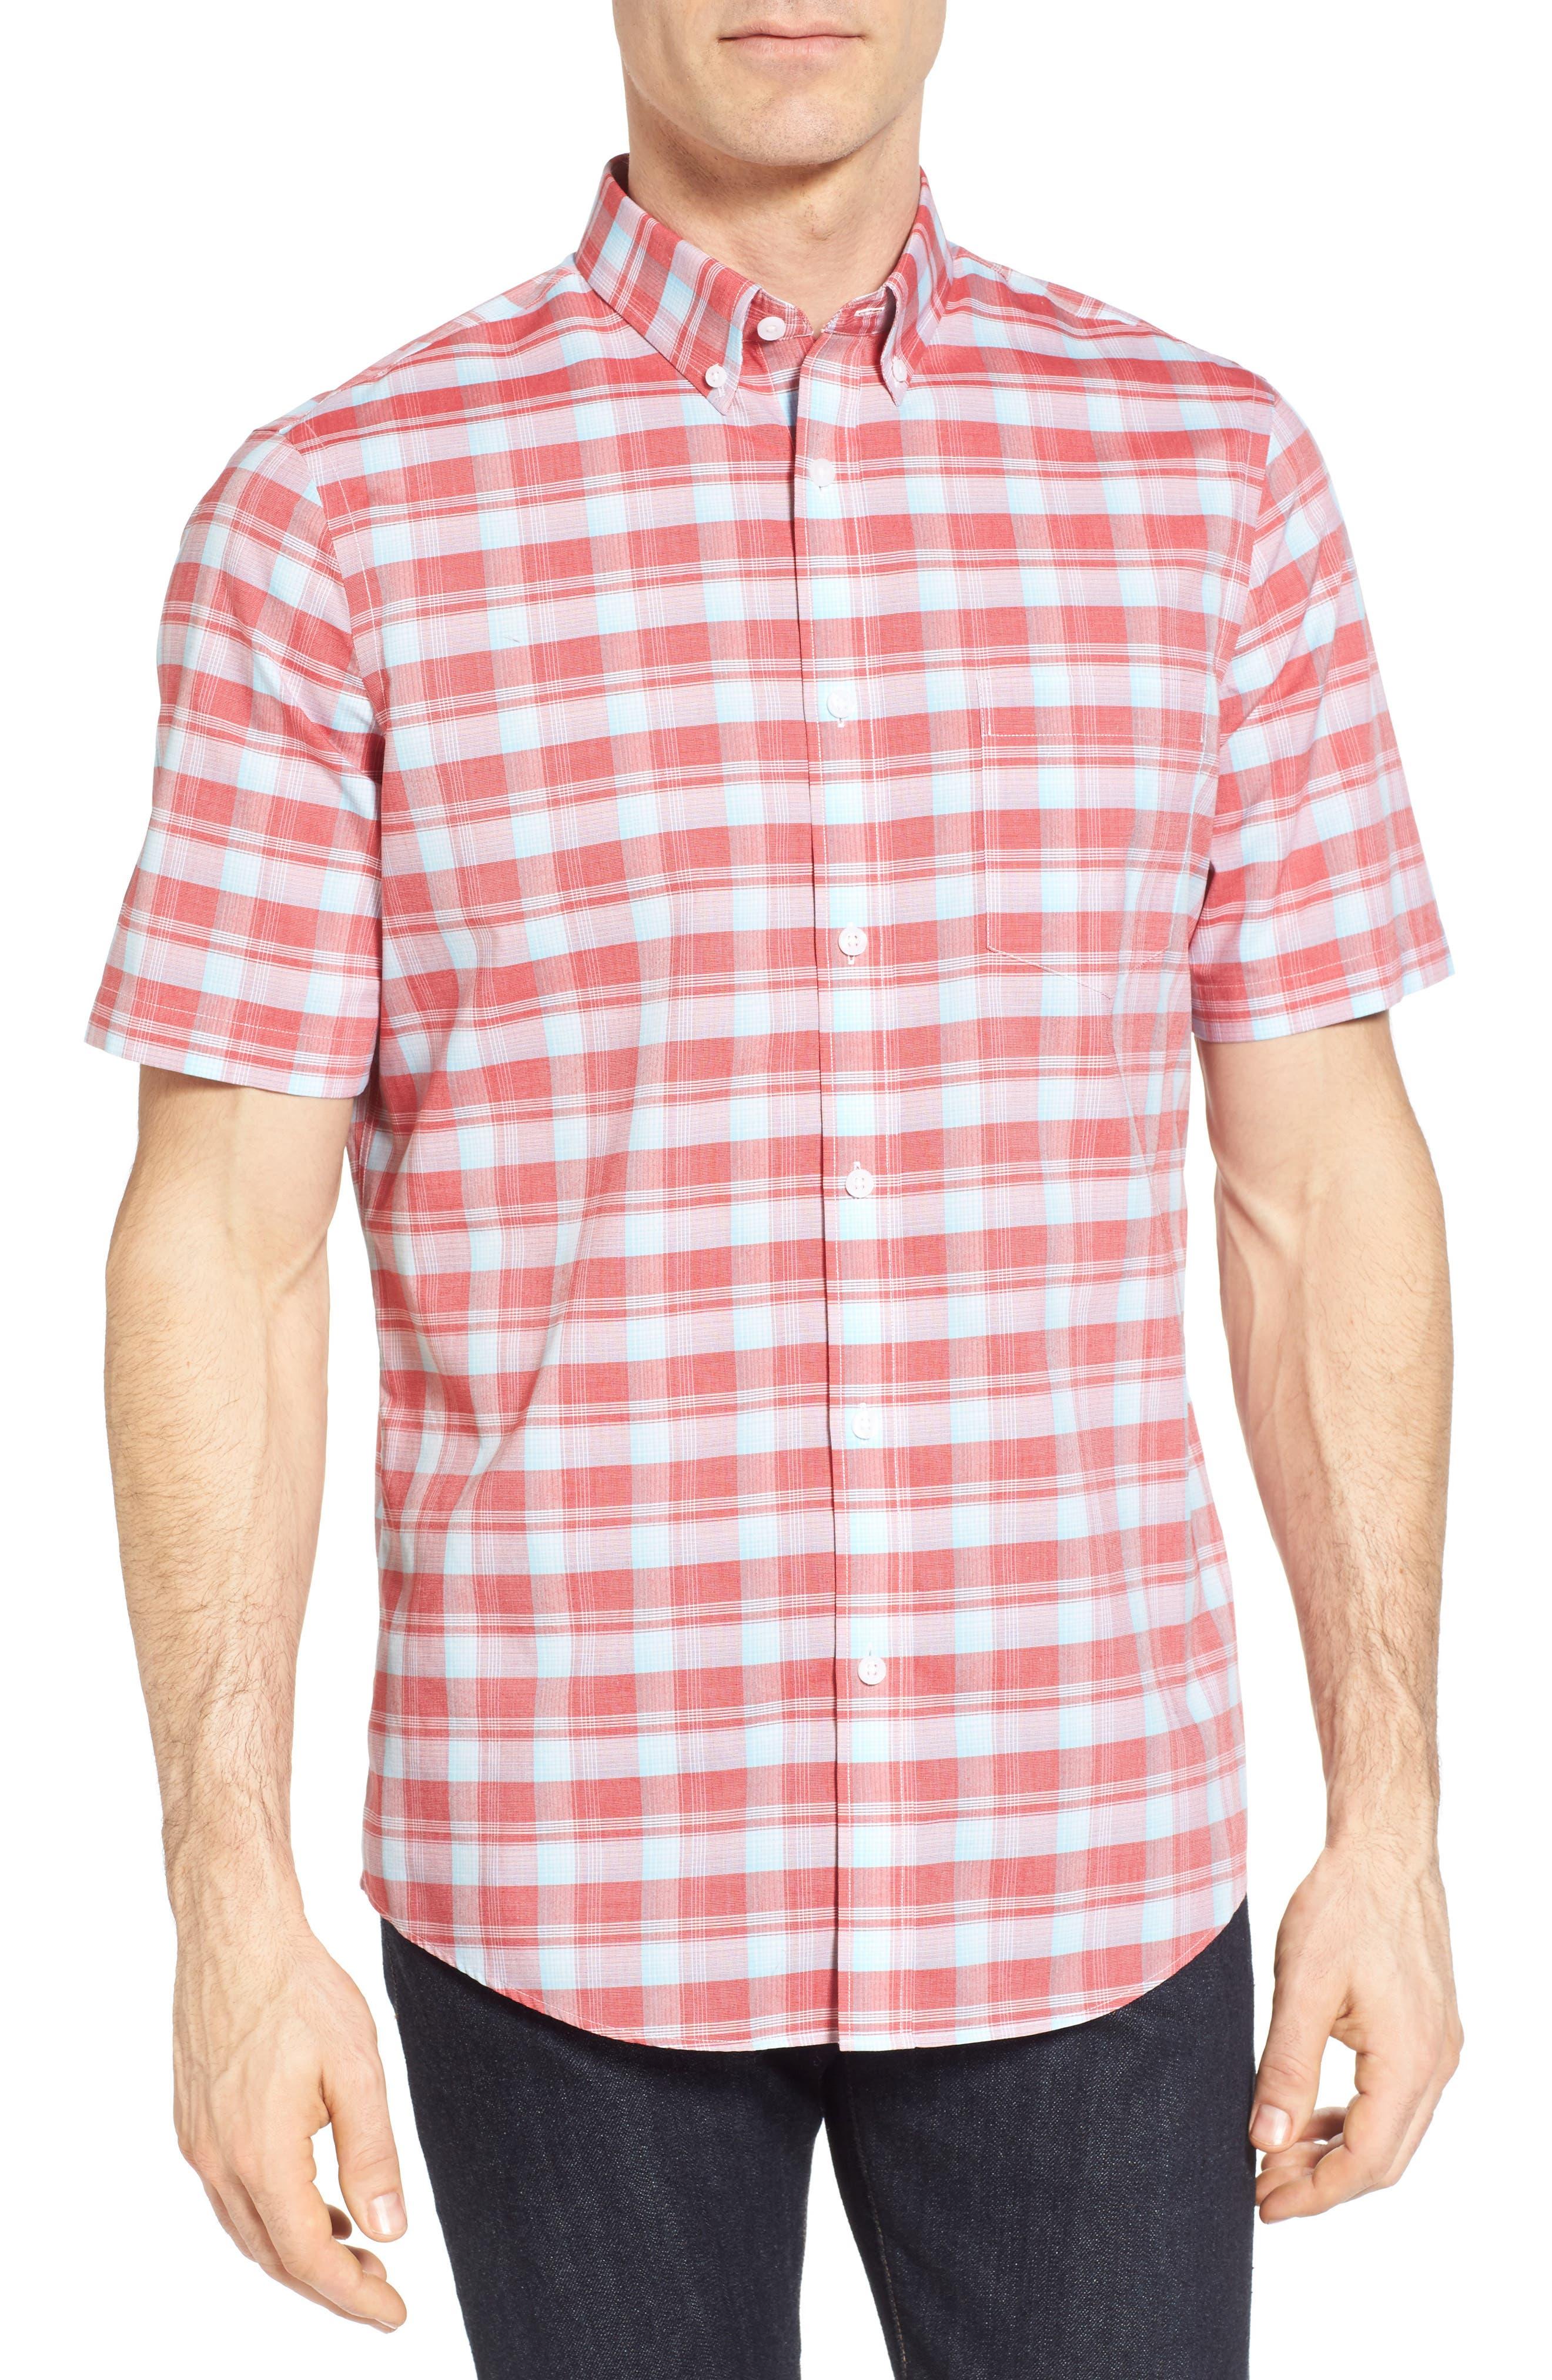 Regular Fit Plaid Sport Shirt,                             Main thumbnail 1, color,                             Red Pompeii Blue Check